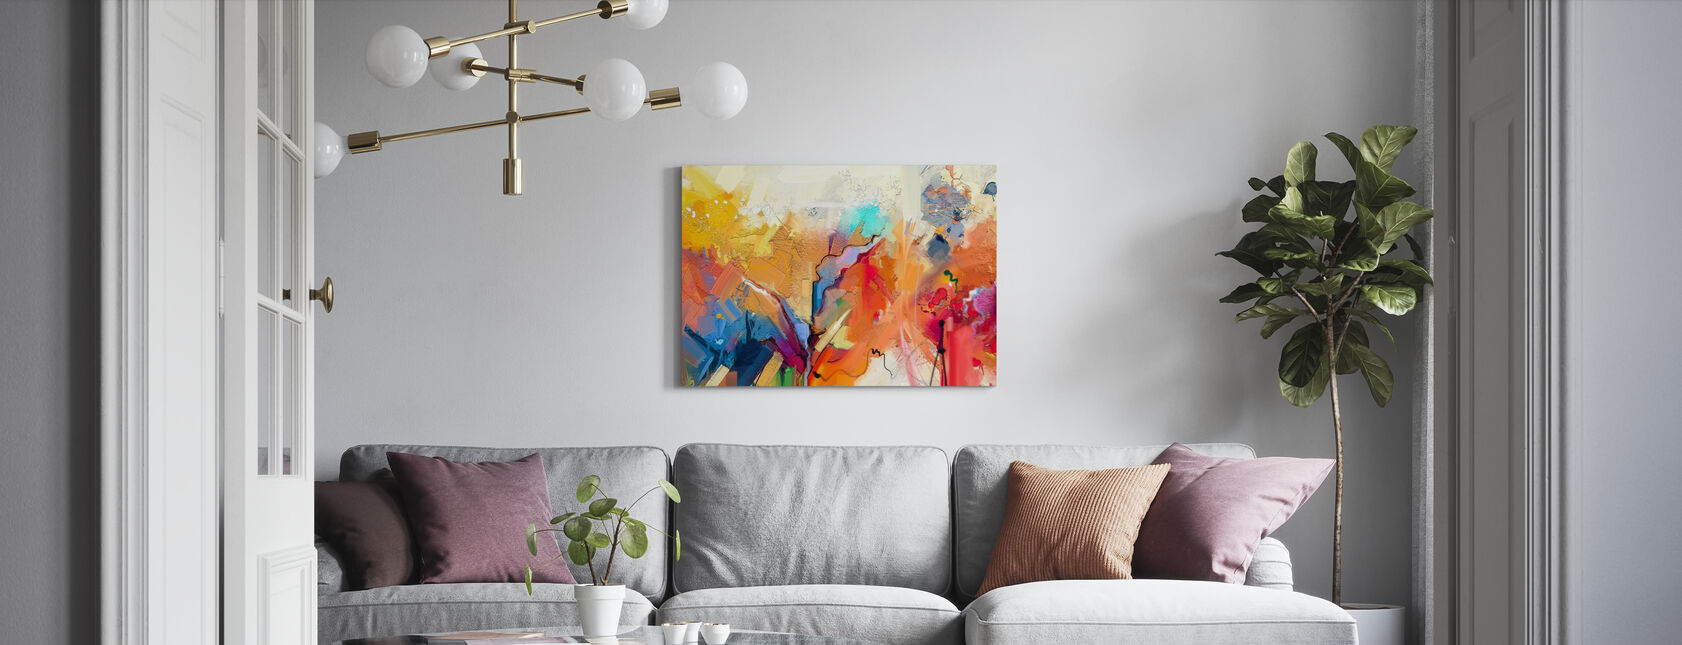 Värikäs abstrakti maalaus - Canvastaulu - Olohuone